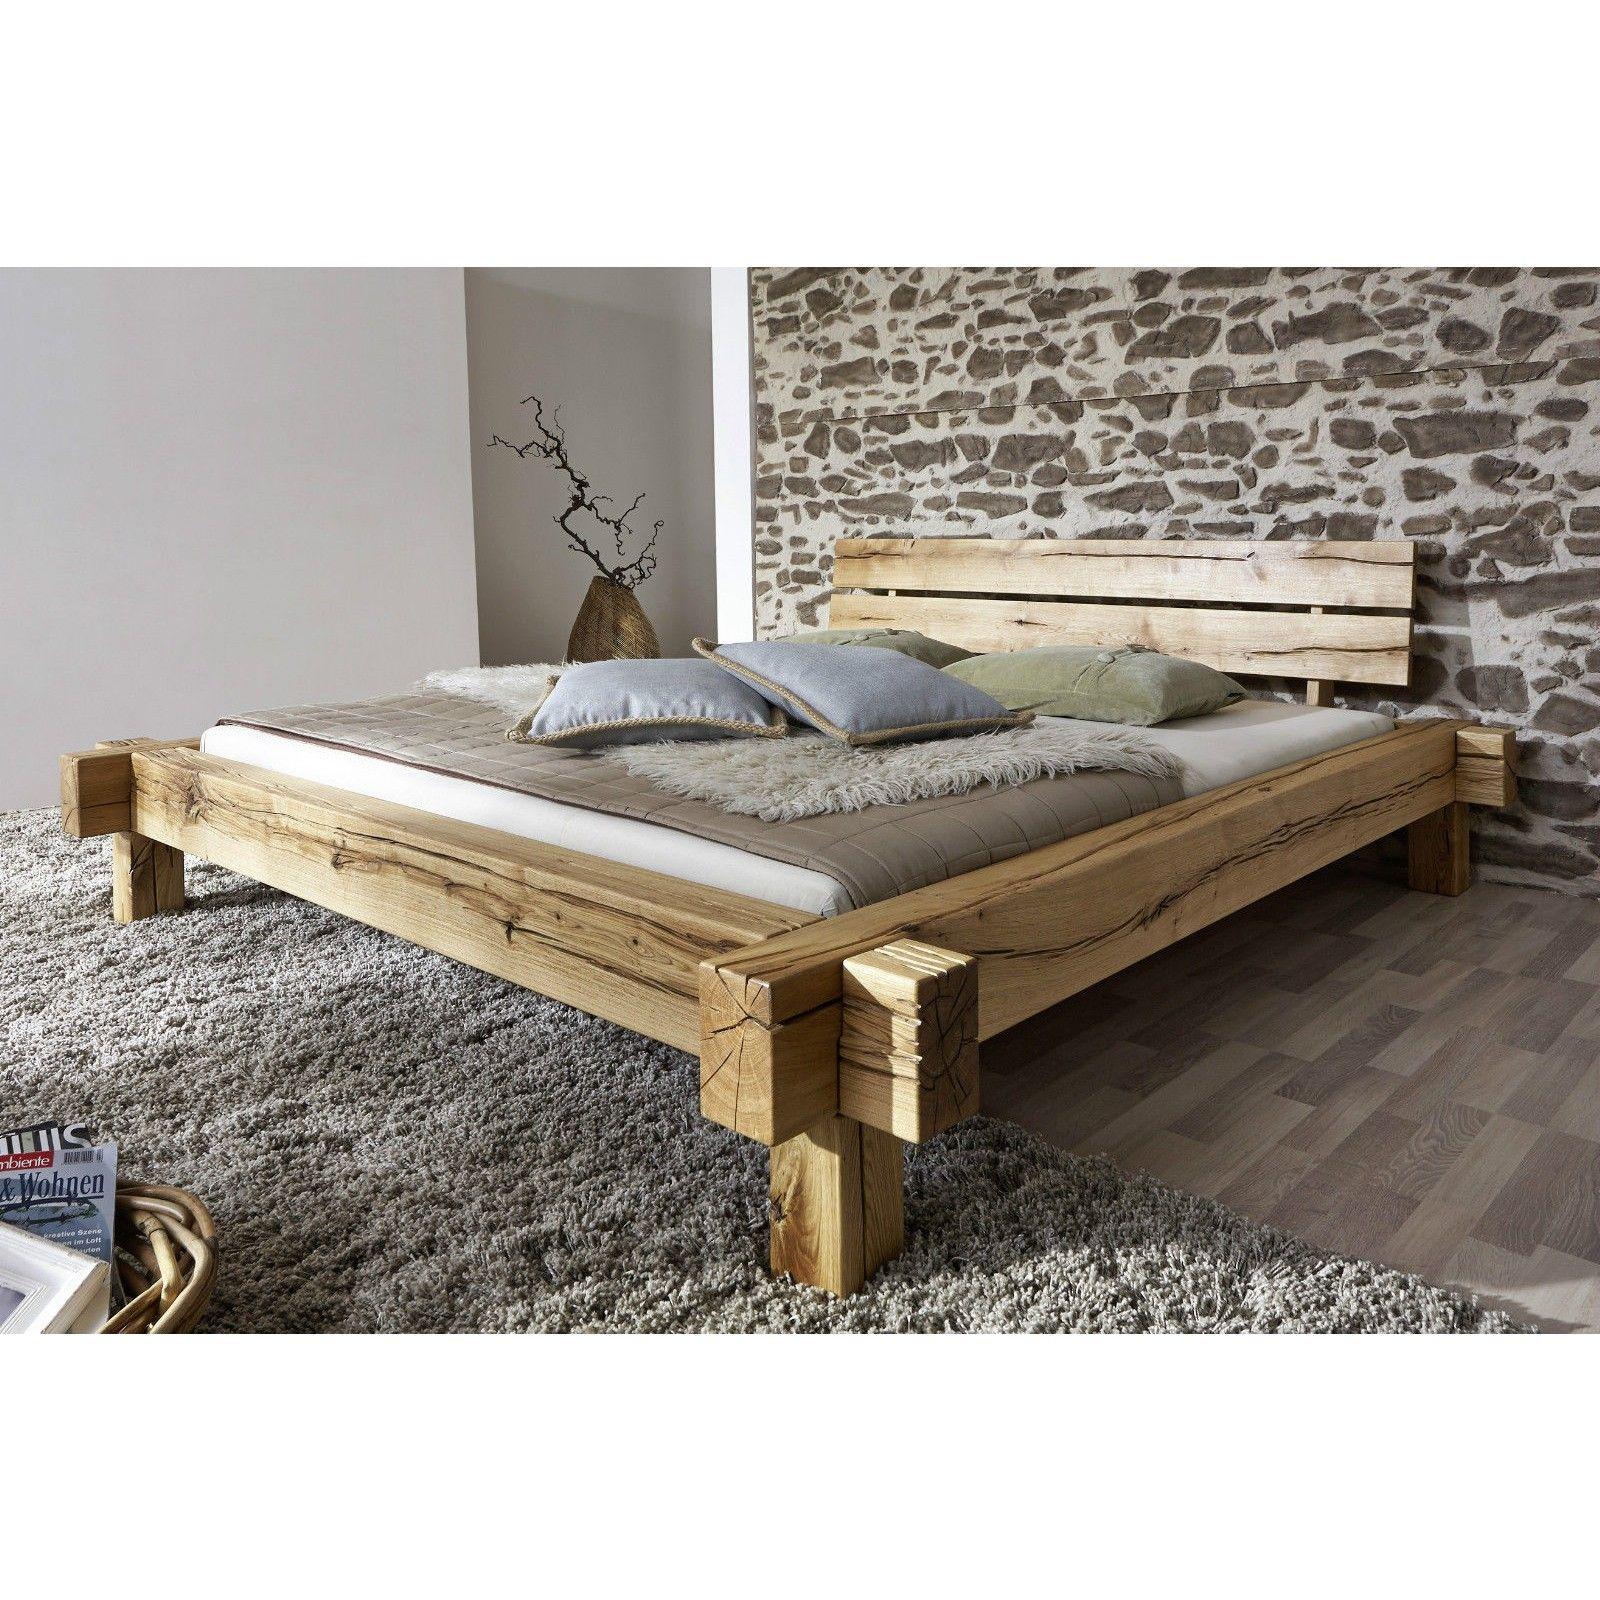 Doppelbett Bett Balkenbett 160x200cm Wildeiche Eiche massiv geölt ...